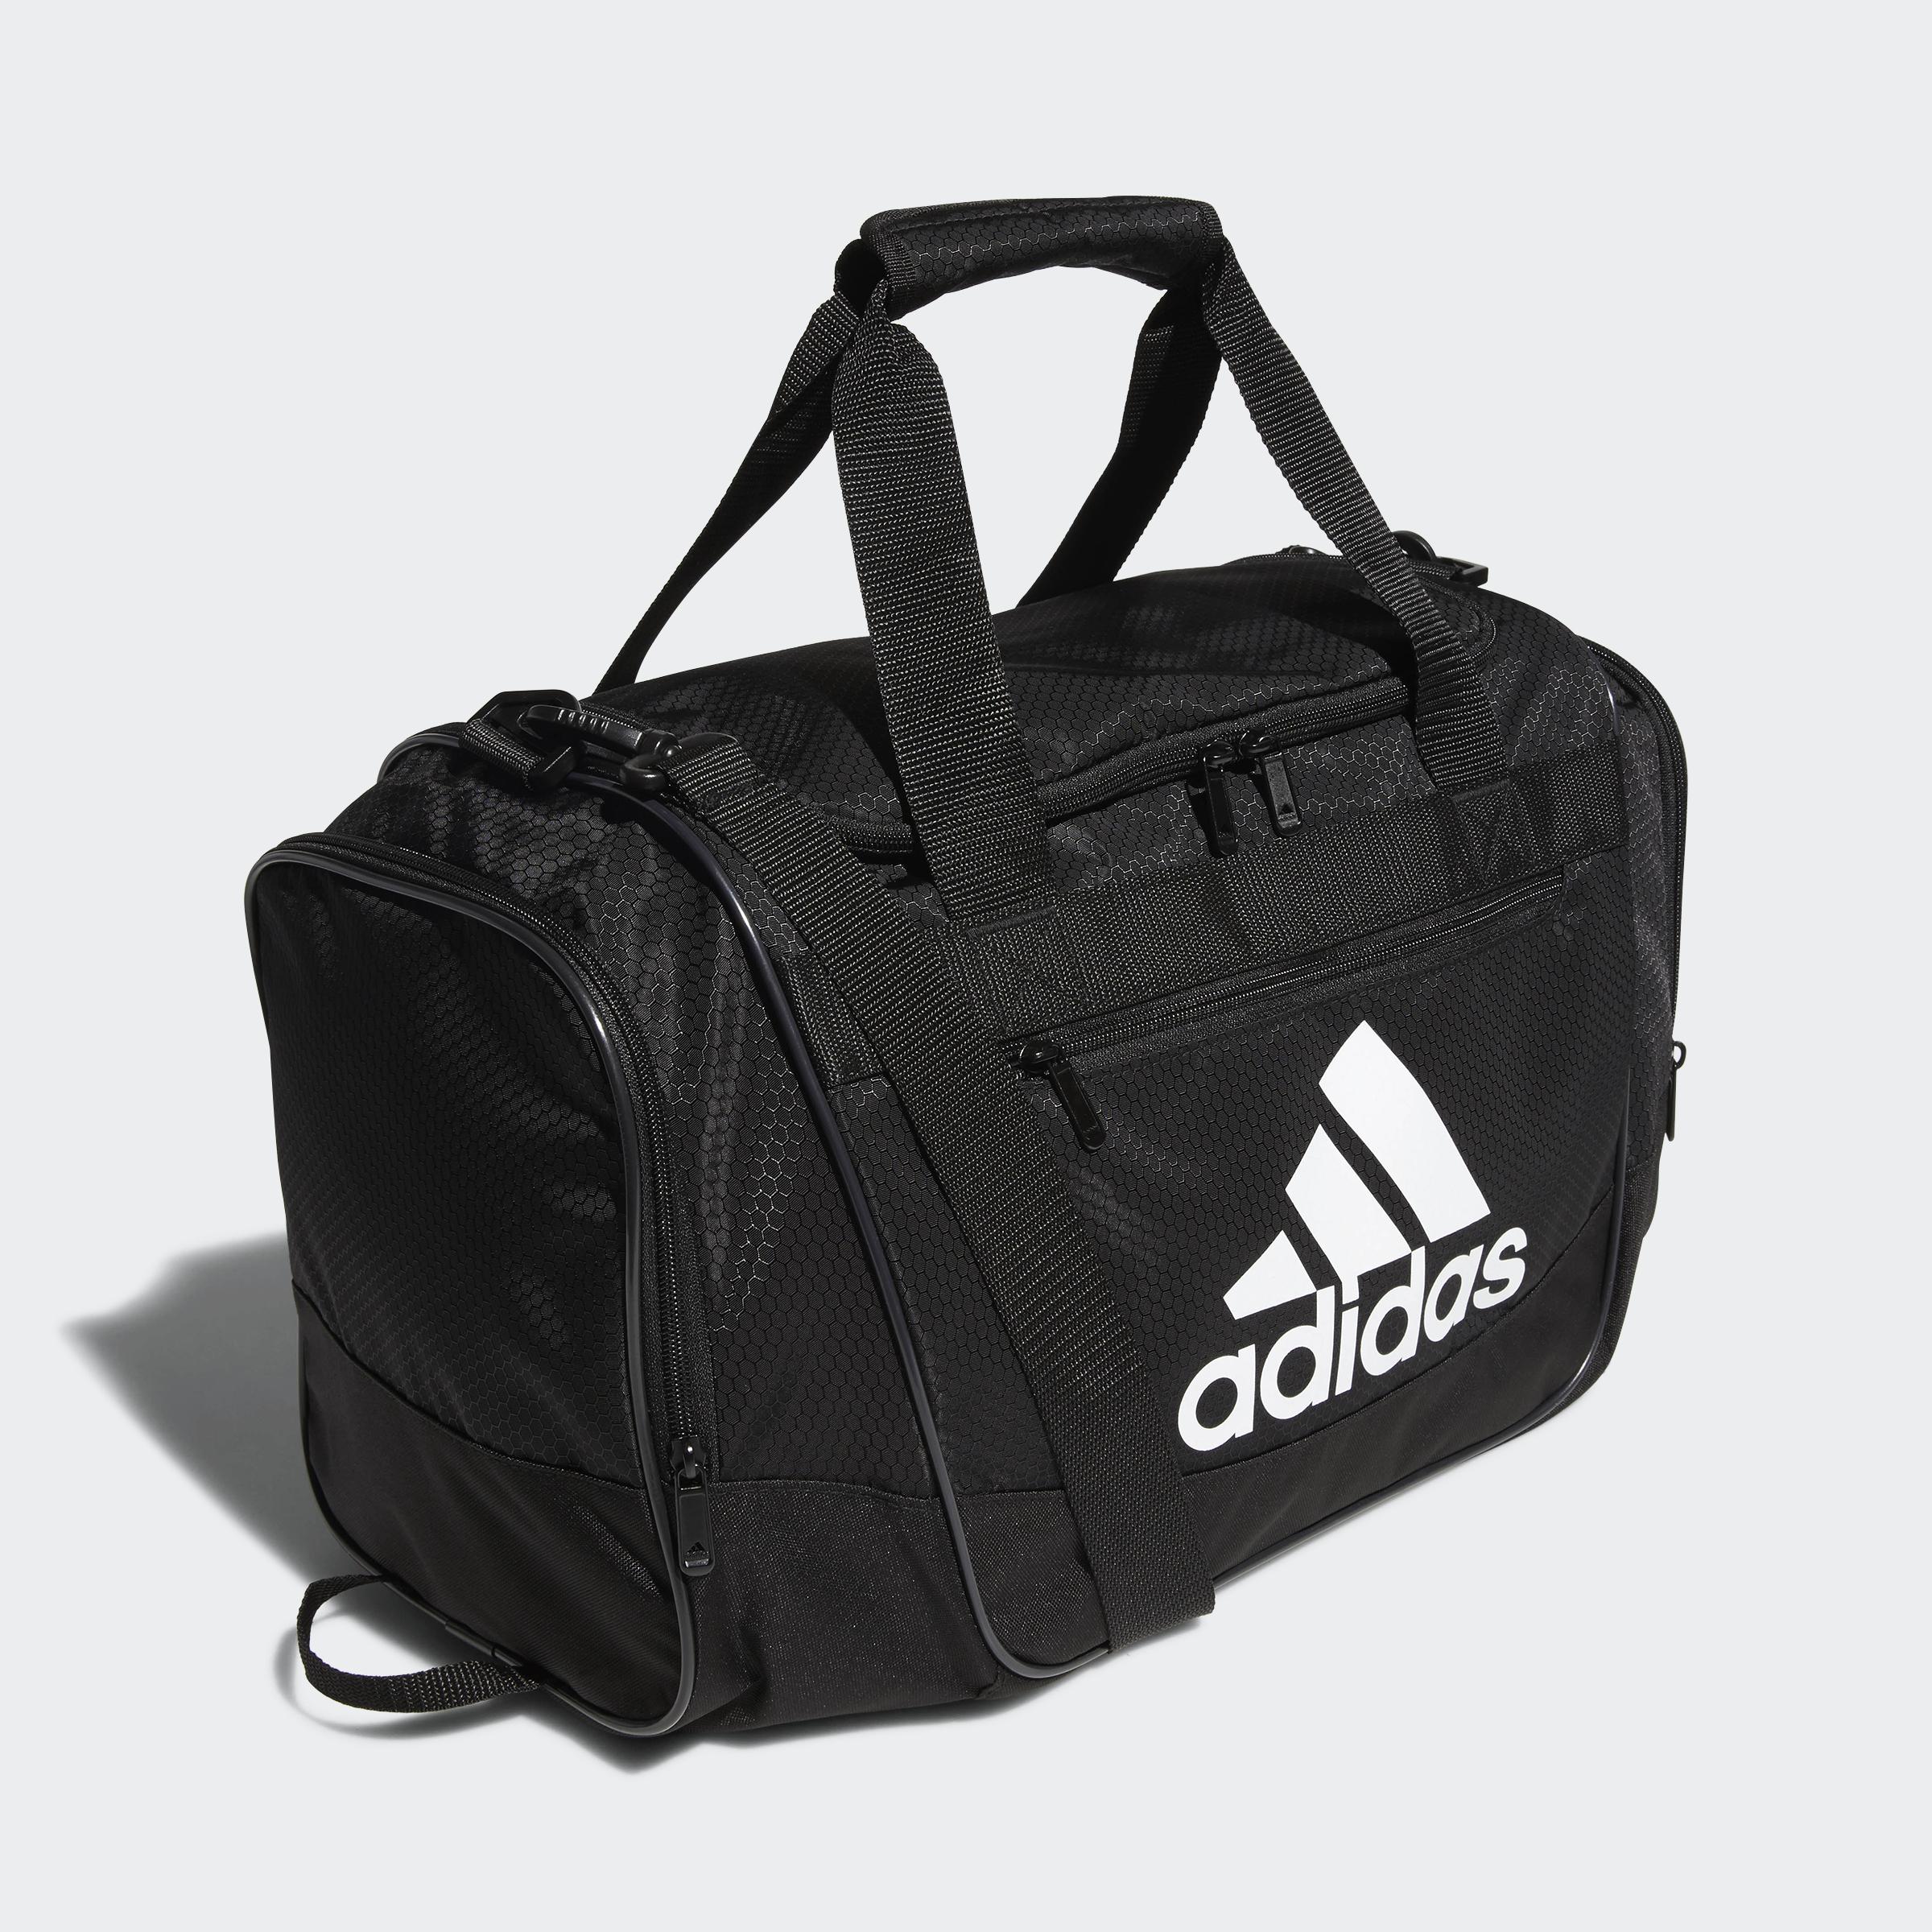 miniature 5 - adidas Defender III Small Duffel  Bags